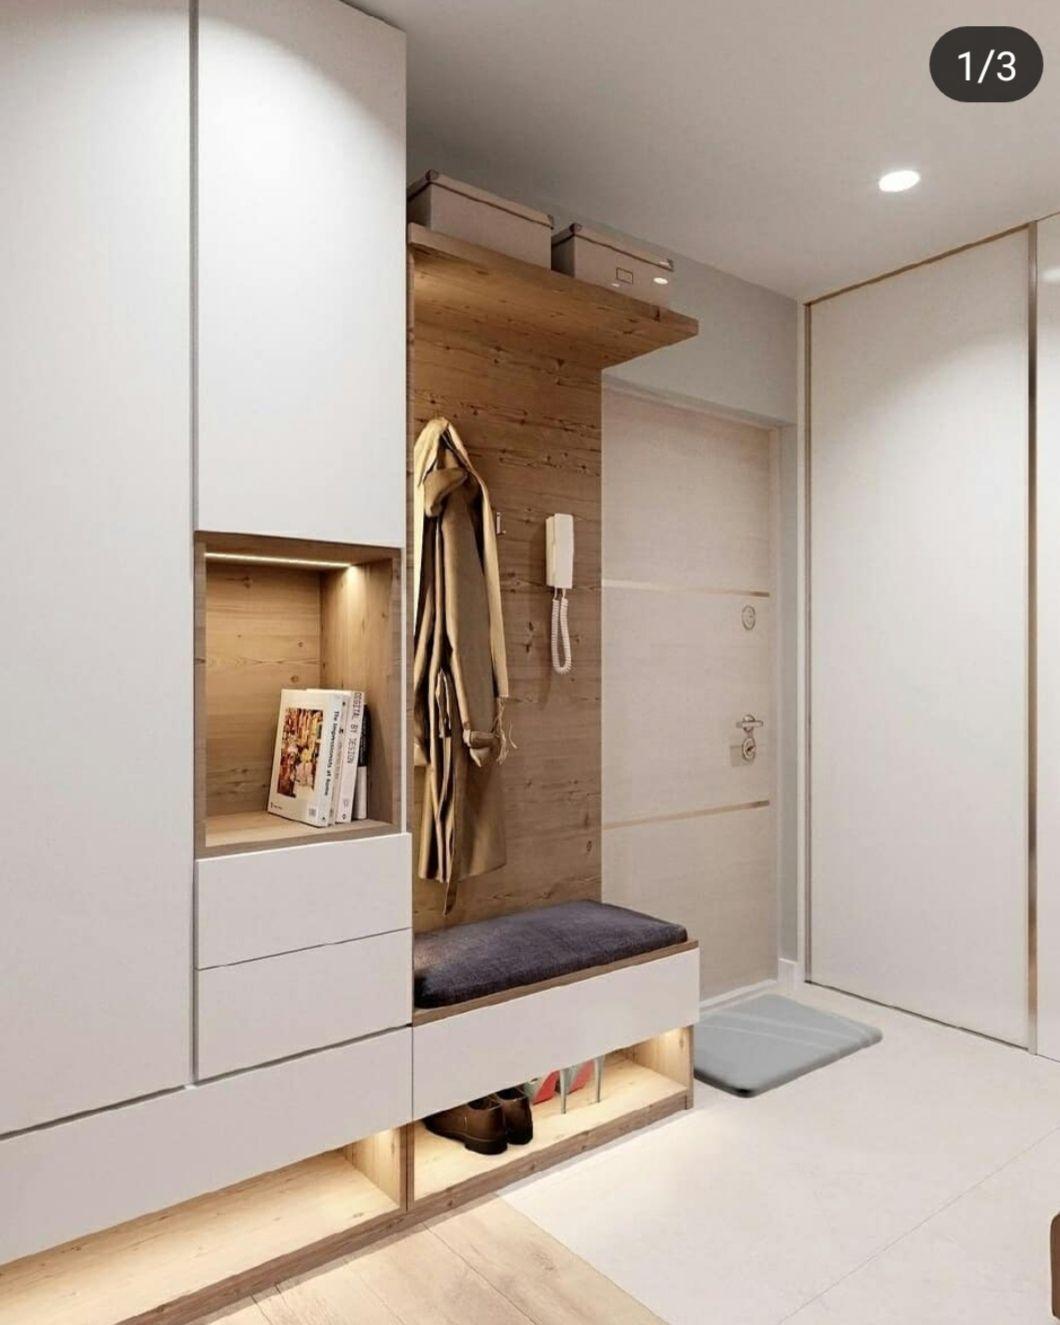 Pin By Hana Brunclikova On Interiors In 2020 Mudroom Entryway Entry Way Design Home Entrance Decor